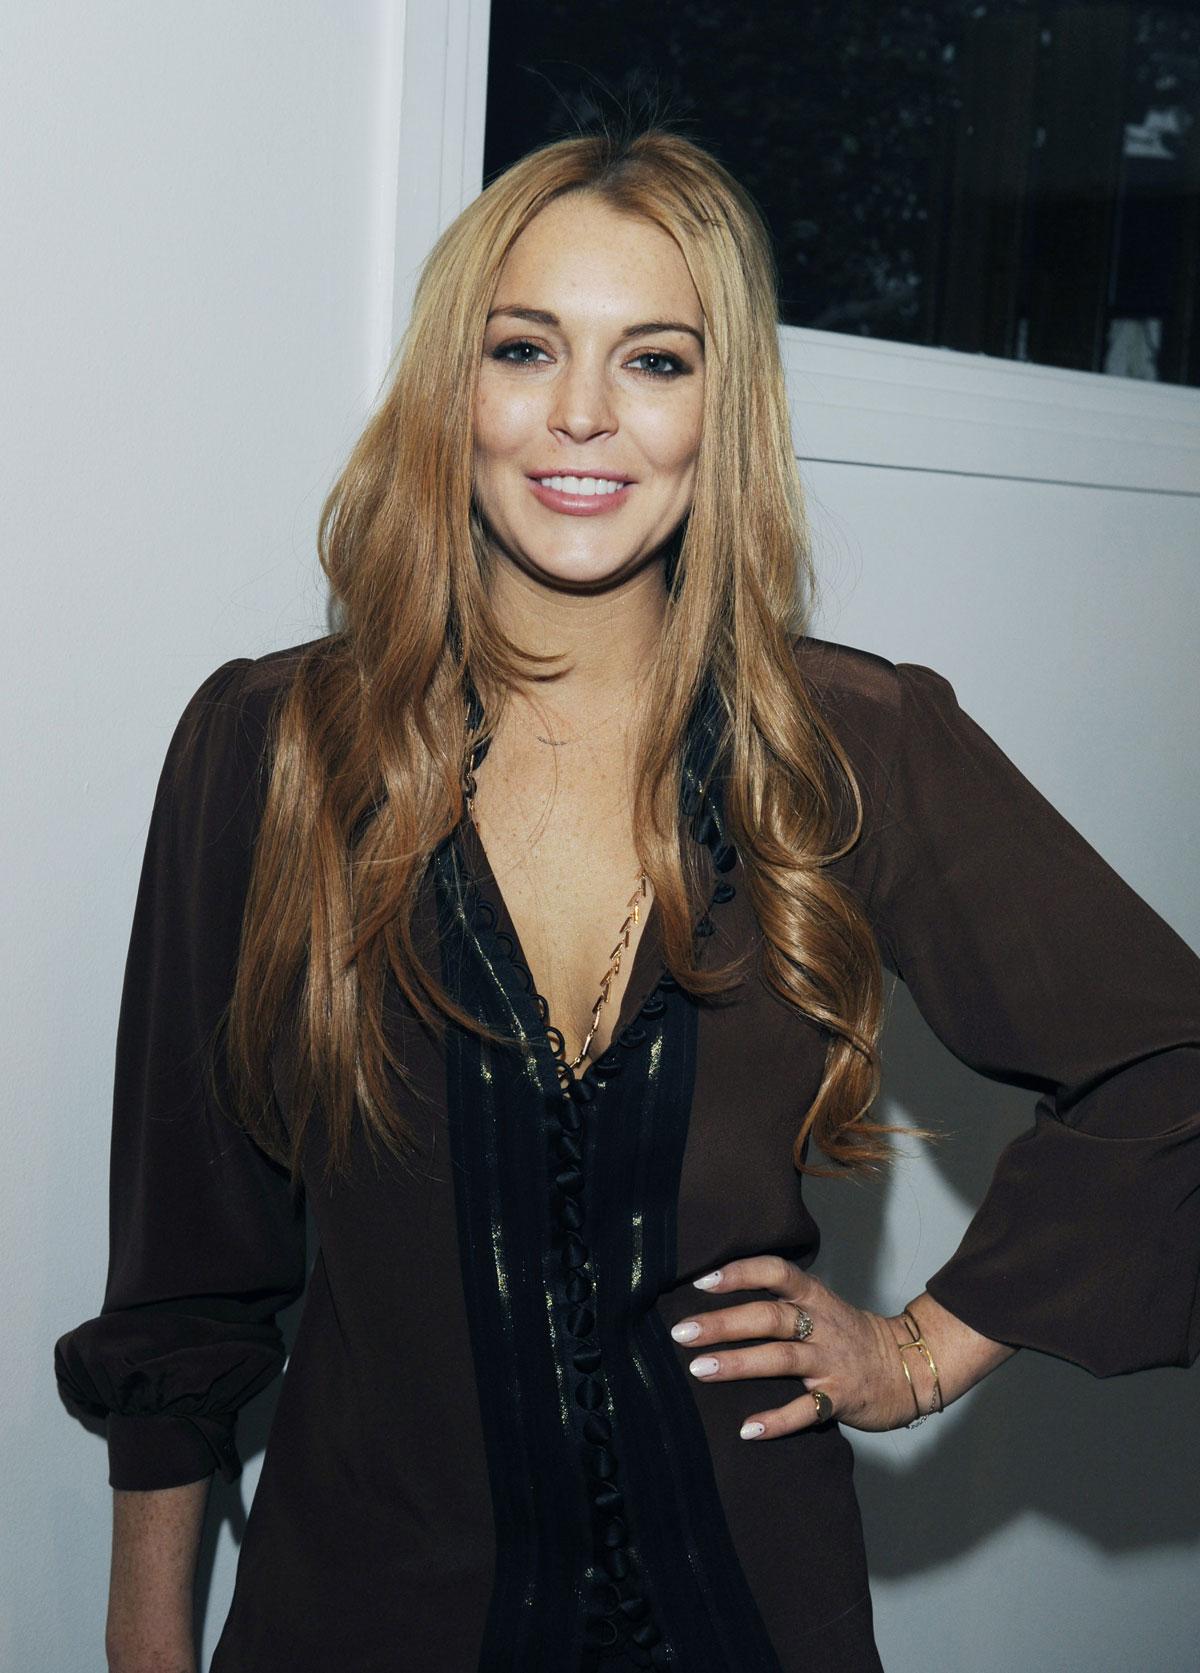 Haruno Sexy Actress Lindsay Lohan At Eva Fehren Jewelry